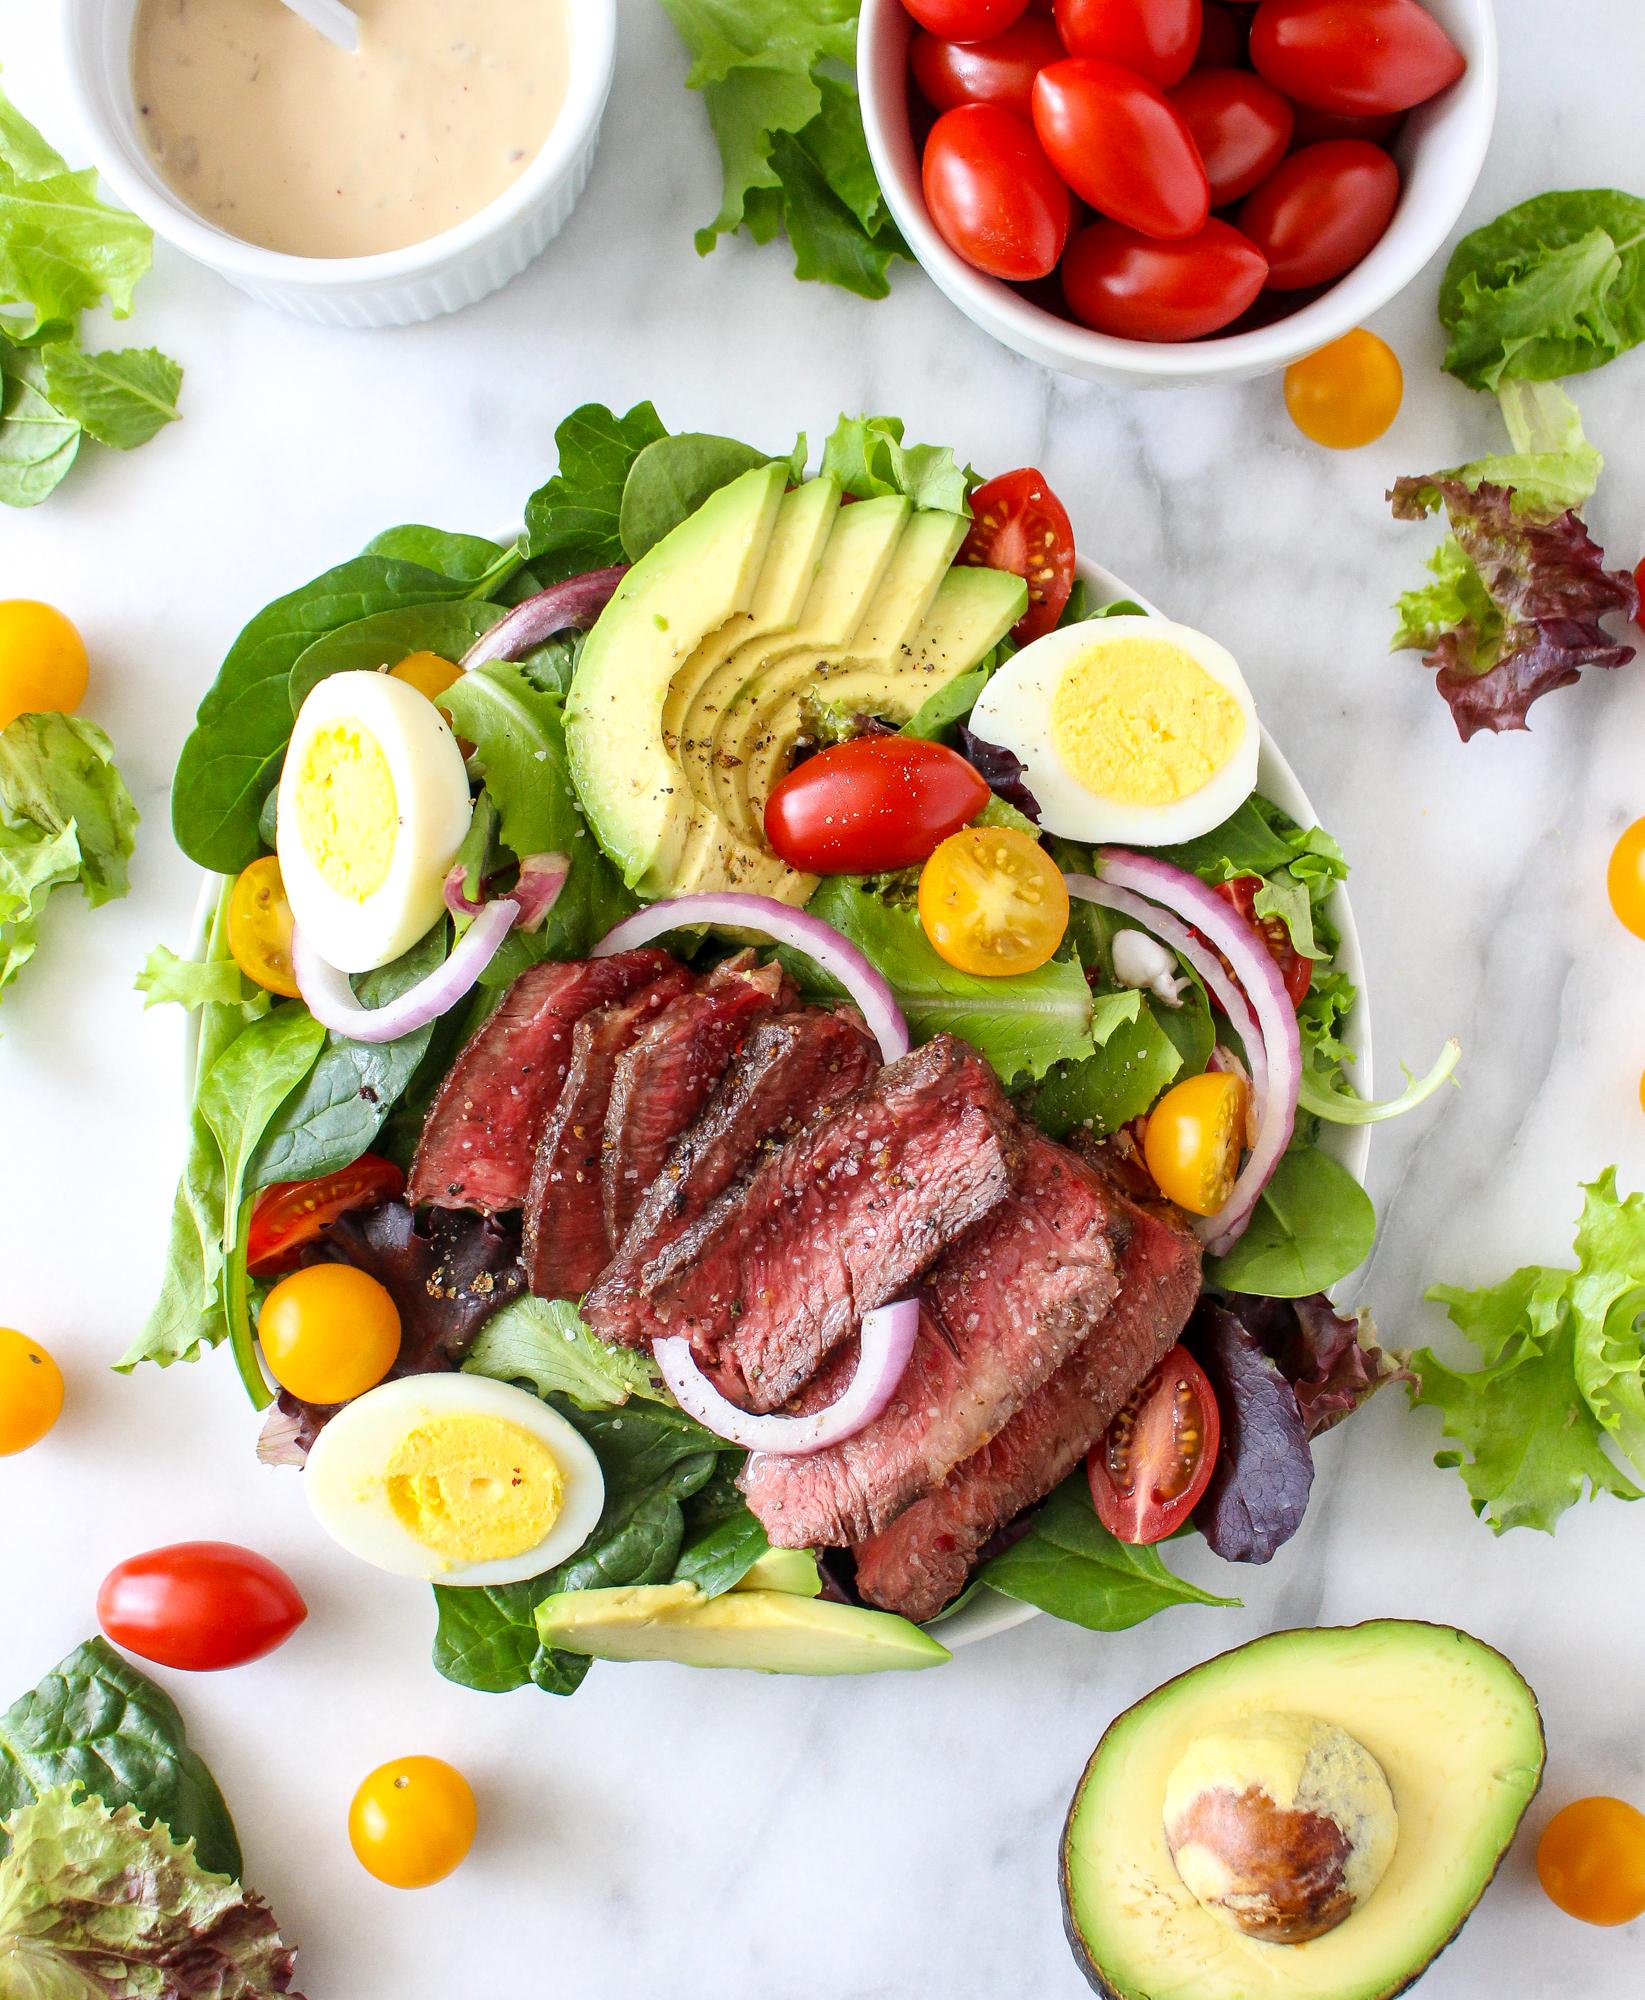 Steak Cobb Salad with Caramelized Onion-Yogurt Dressing